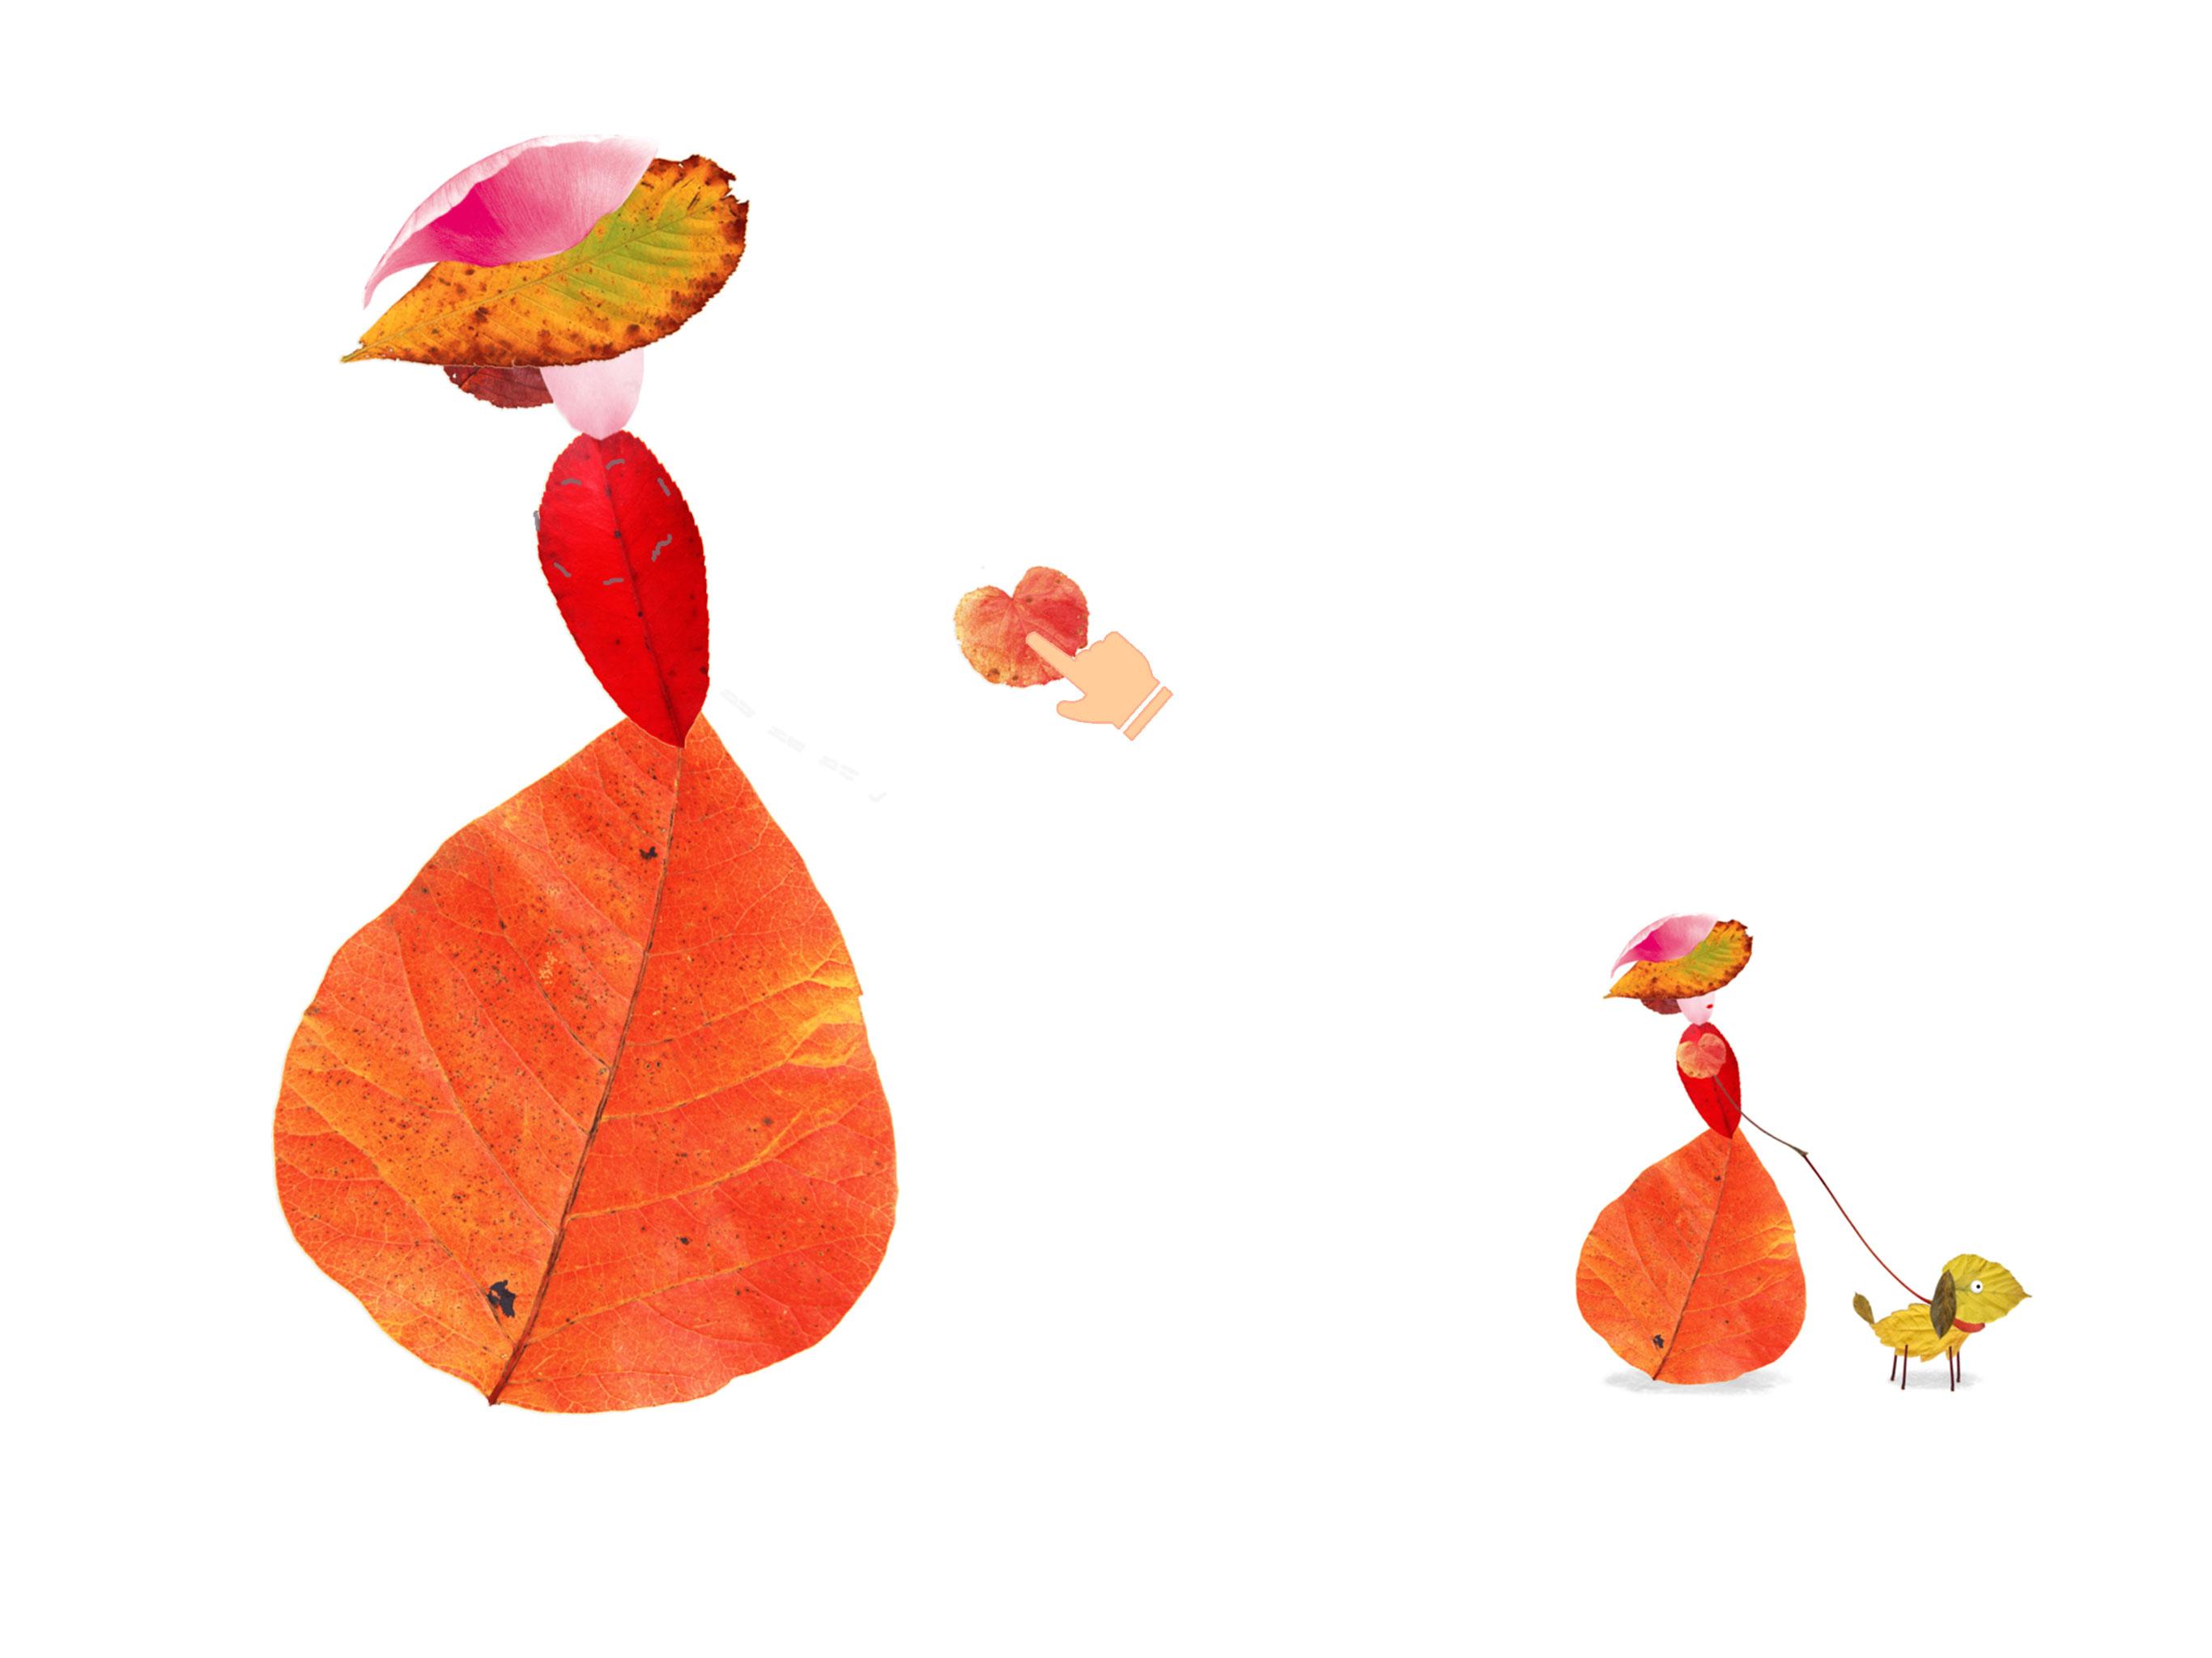 Labo Leaves – 18 Leaf Crafts & Activities for Kids 3+